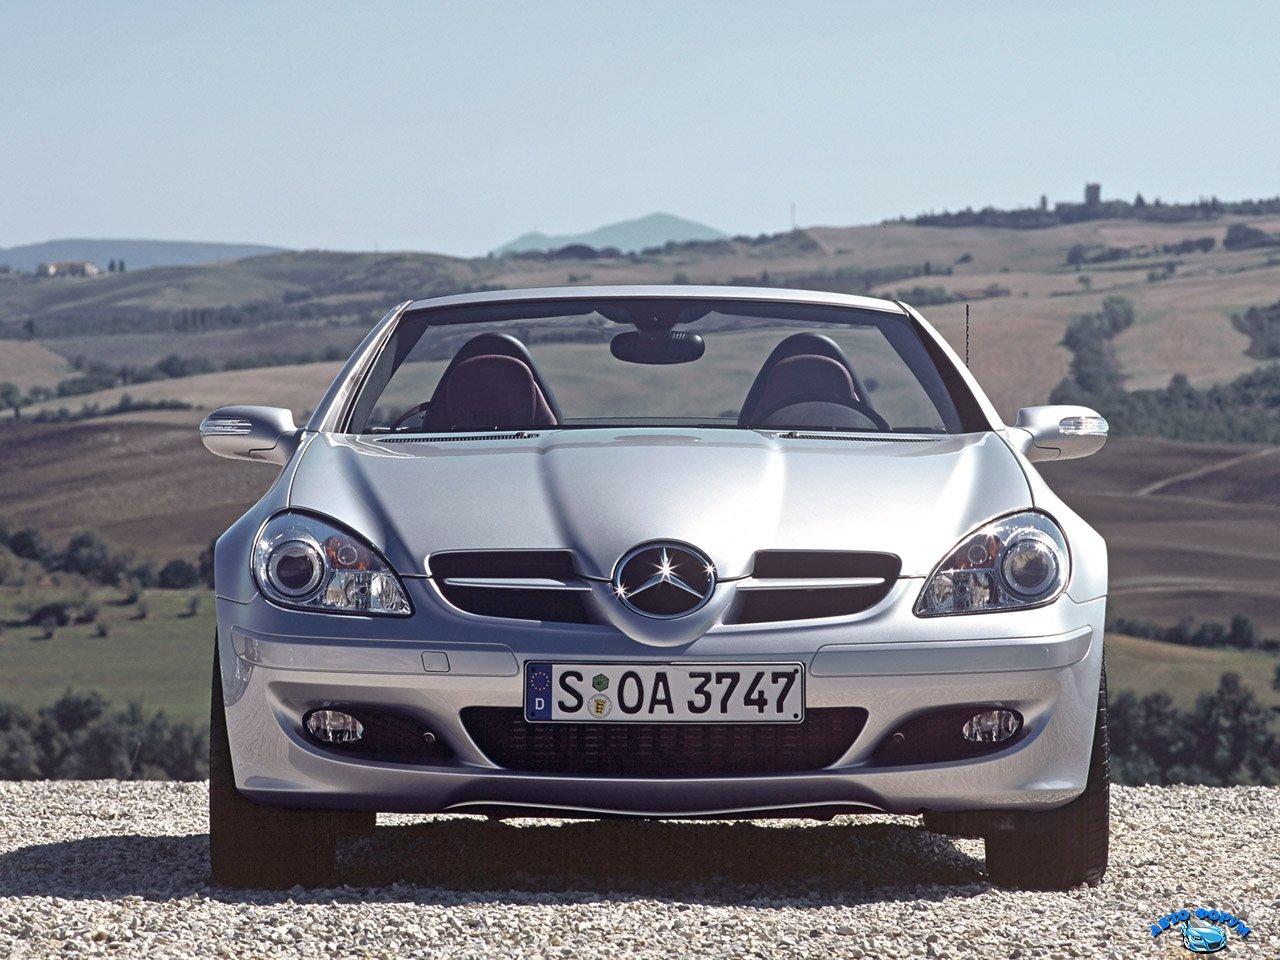 2004-Mercedes-Benz-SLK-55-AMG-F-Hills-1280x960.jpg